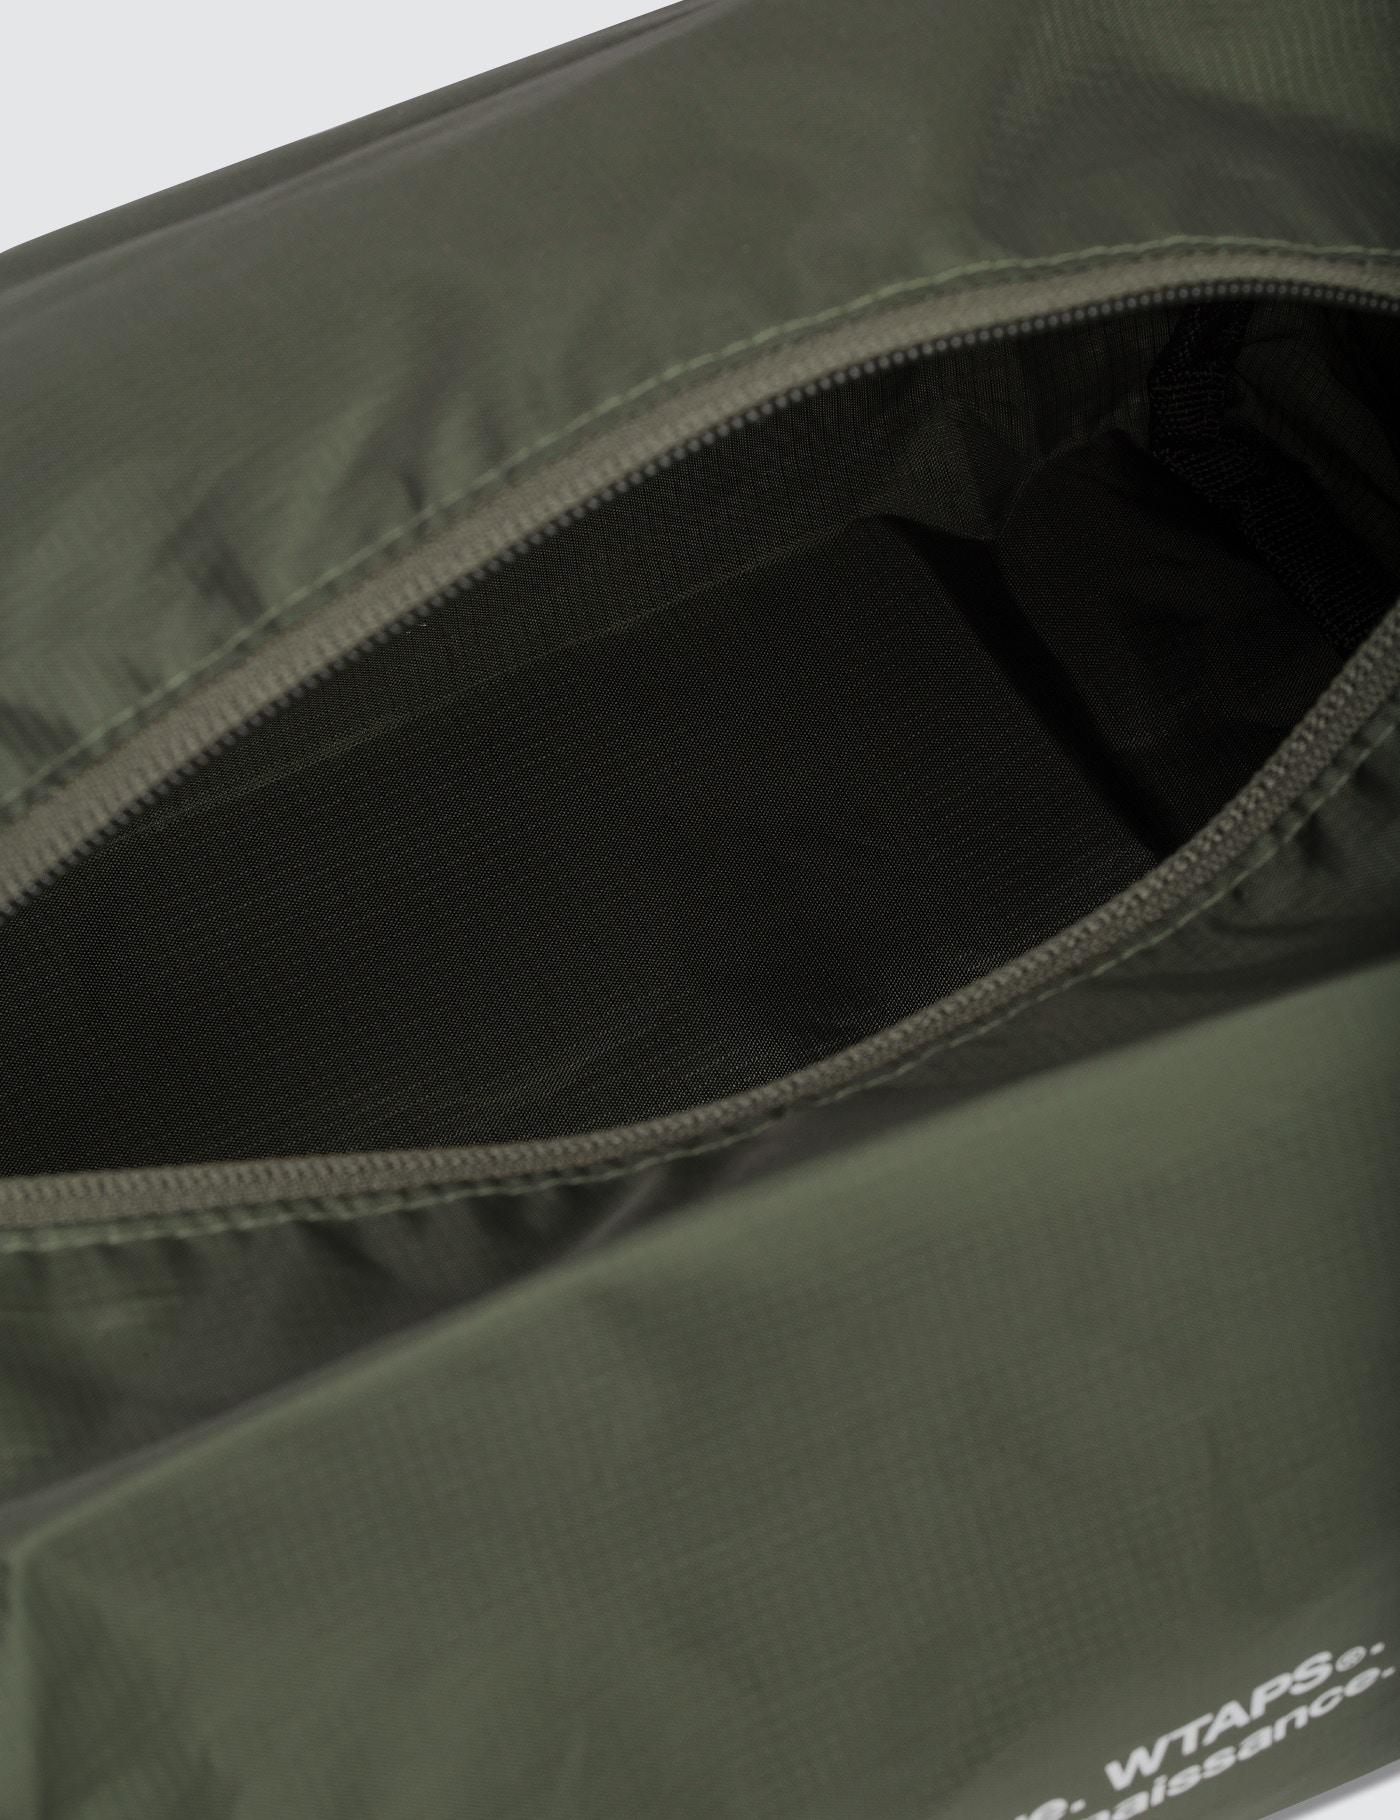 8aa4b99e1440 Lyst - Herschel Supply Co. Wtaps X W-382 Toiletry Bag in Green for Men